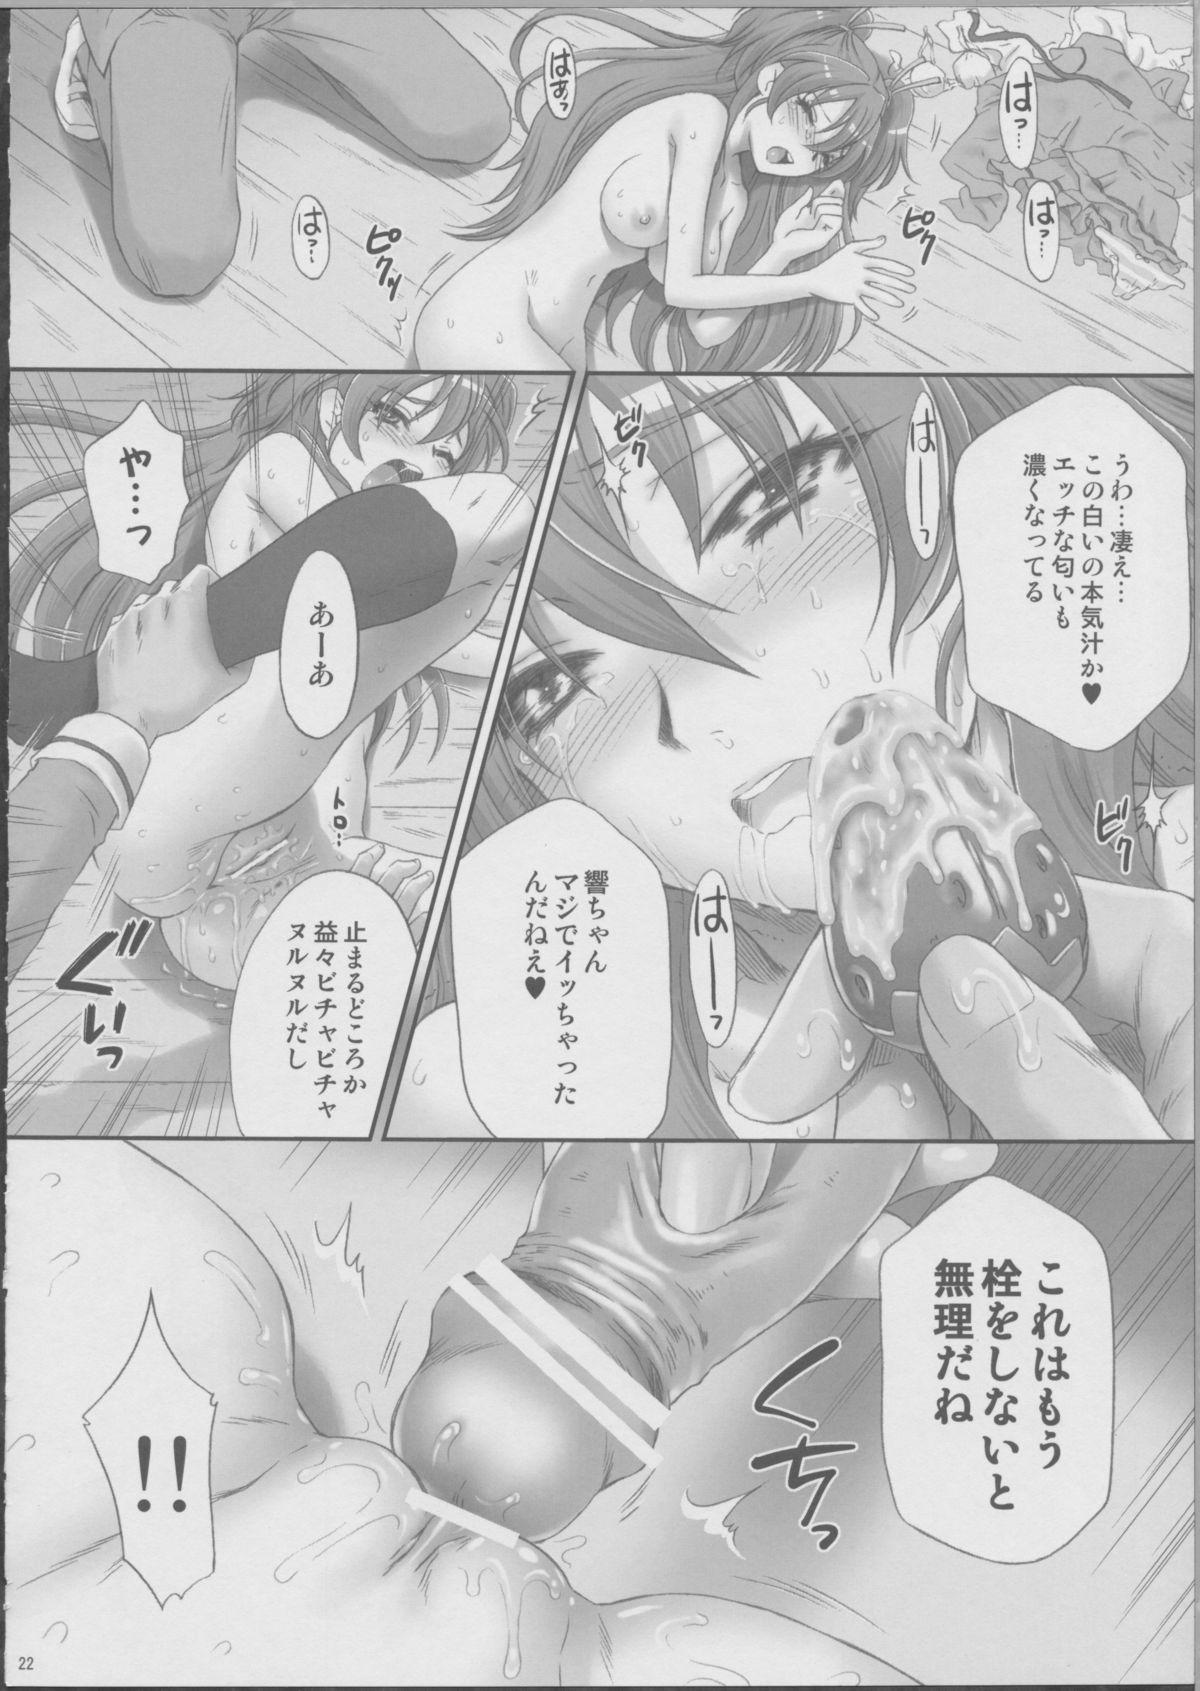 Hibiki de asobou ♪ 20